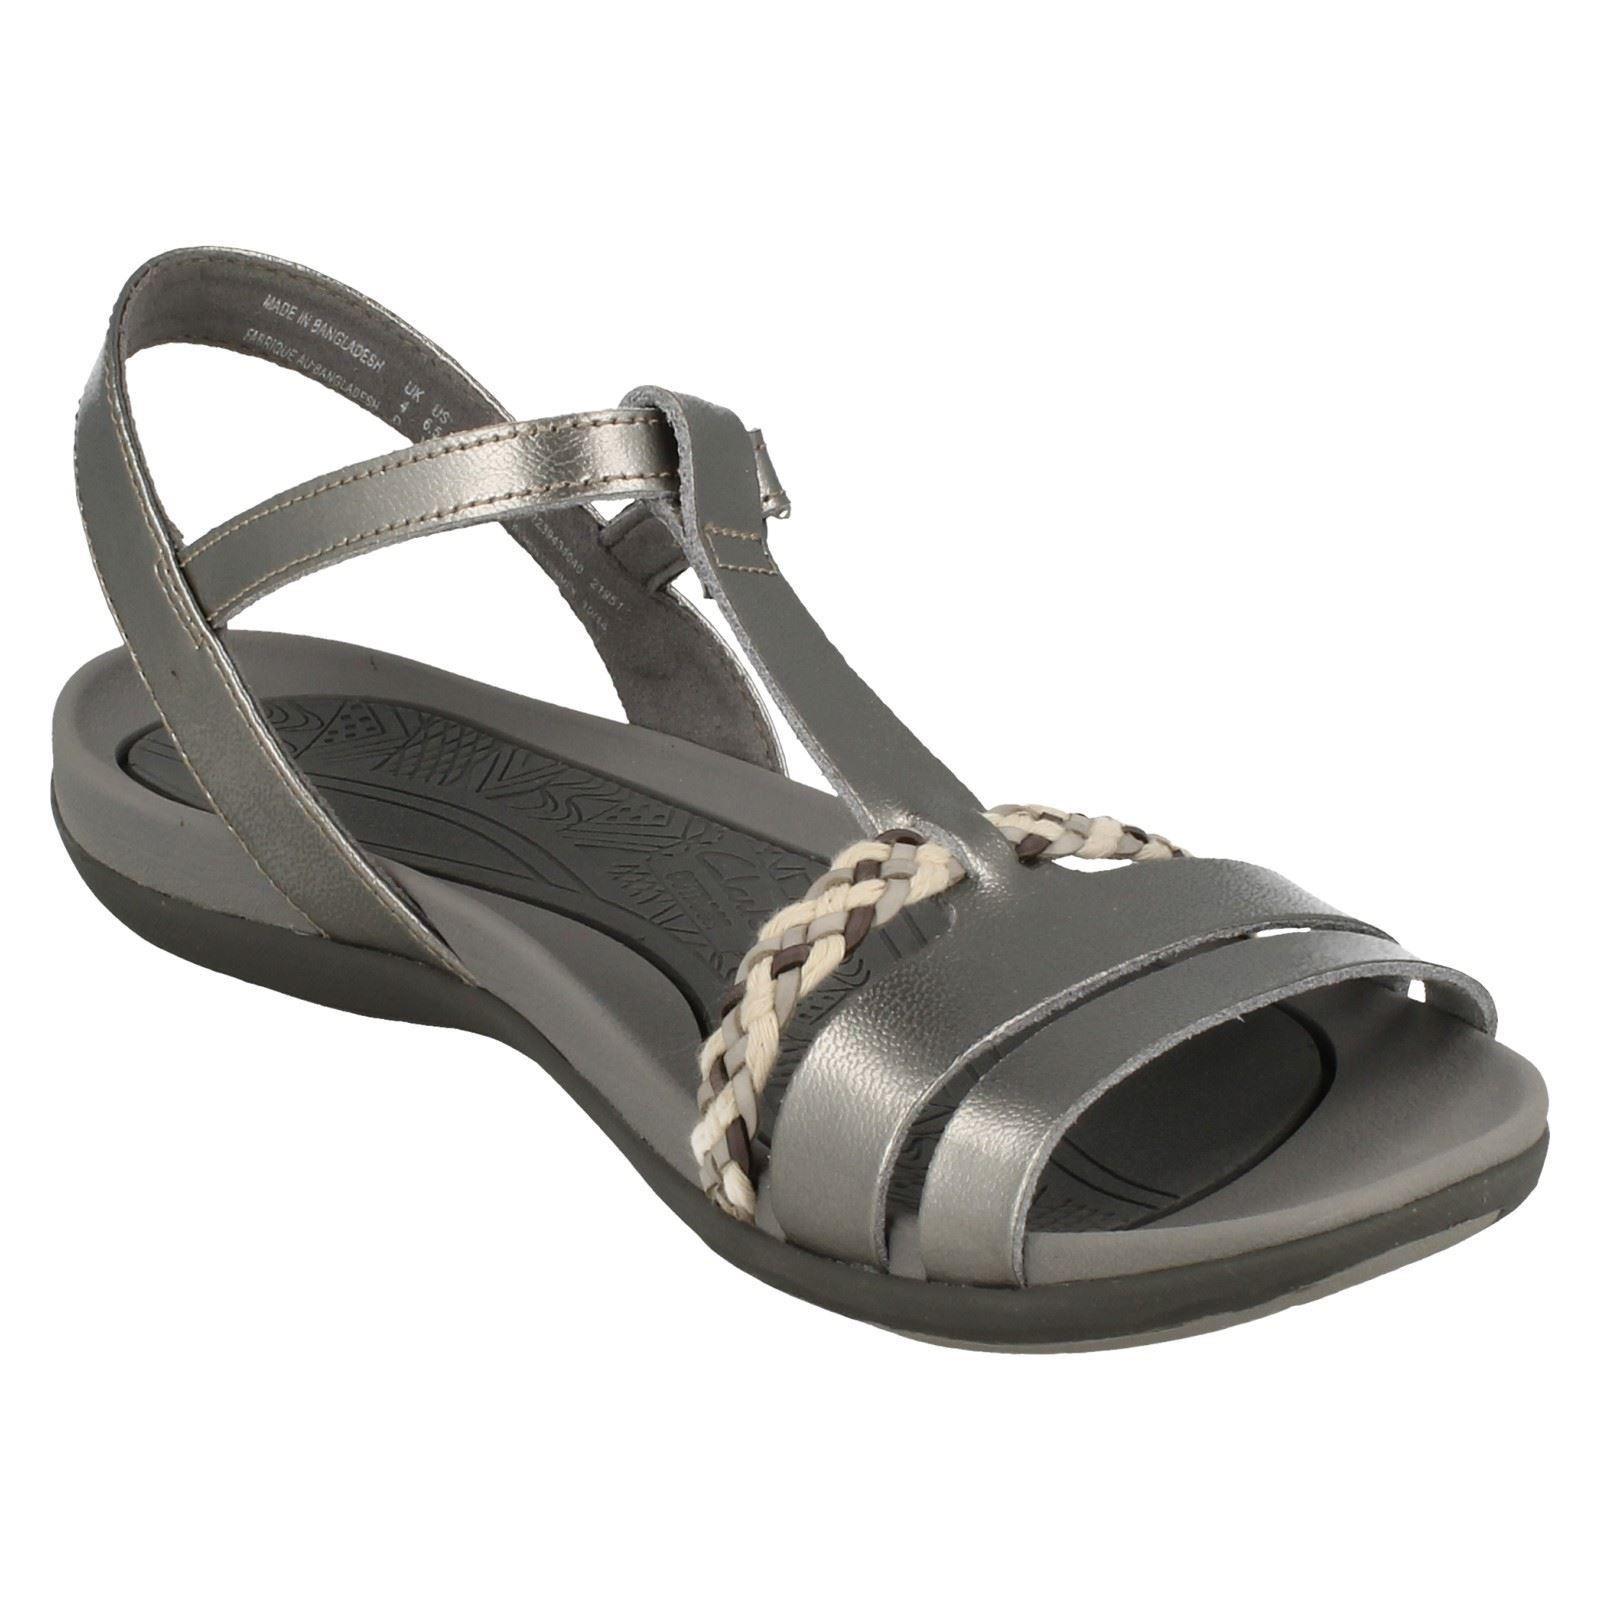 284c506316a14 Ladies Clarks Casual Summer Sandals Tealite Grace Silver D UK 6.5 ...